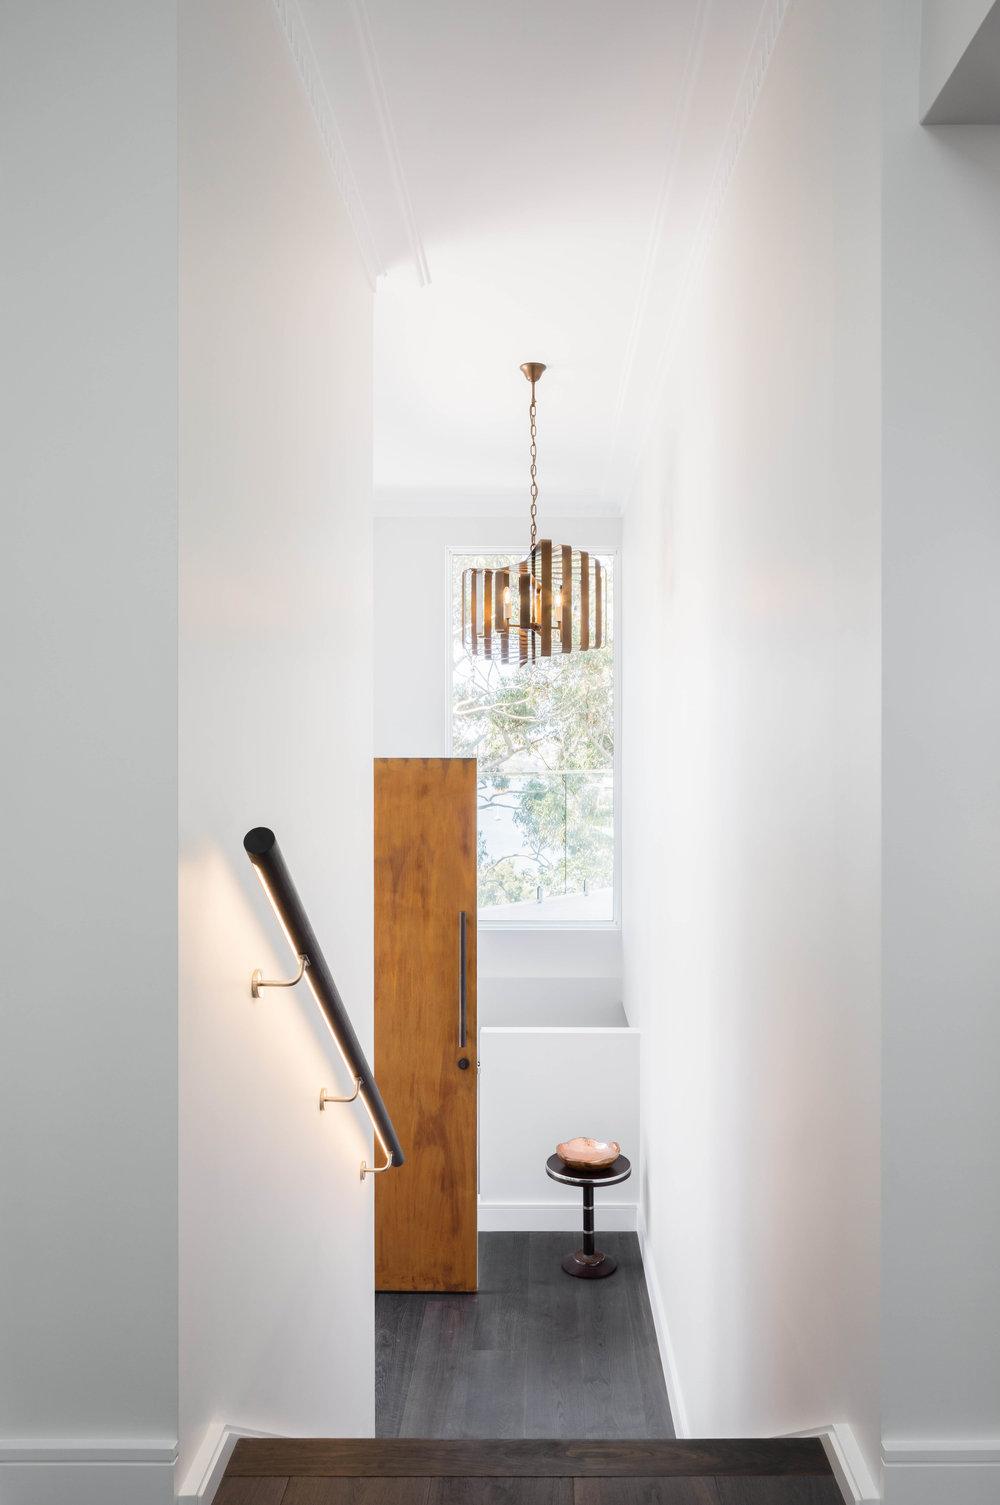 Bijl_Architecture_Gitarren_Haus_03.jpg